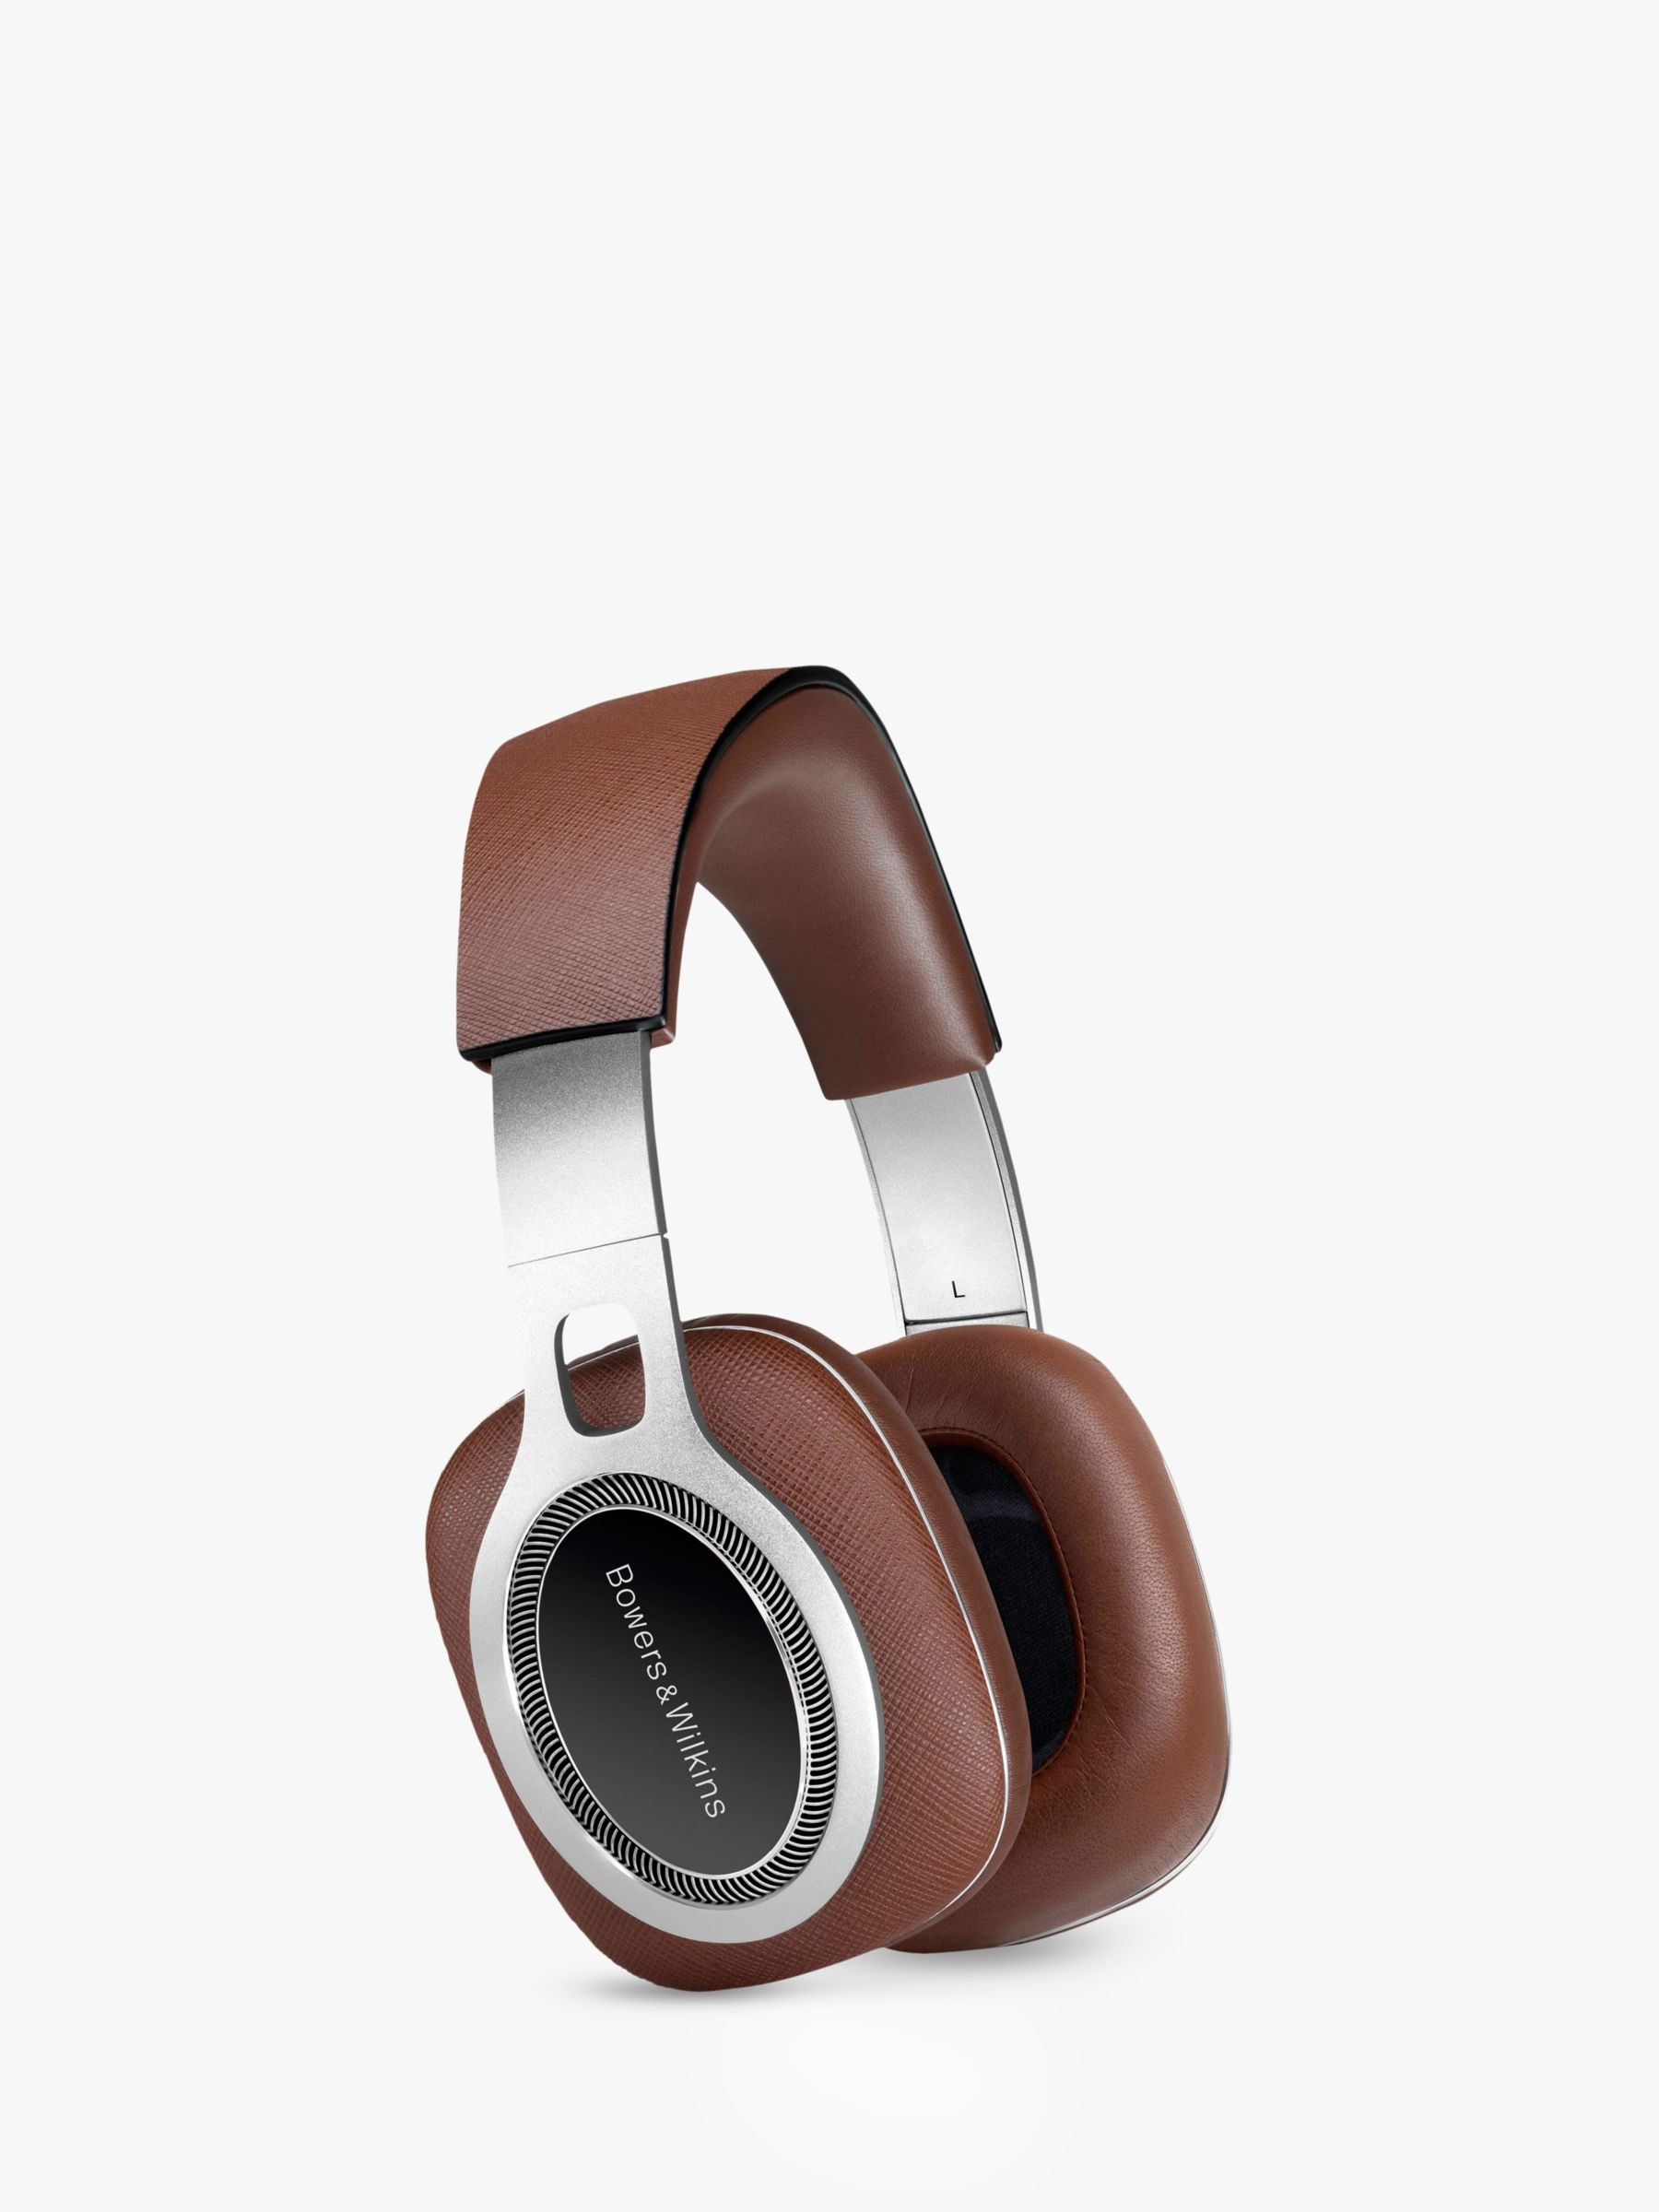 Bowers & Wilkins Bowers & Wilkins P9 Signature Over-Ear Headphones, Brown